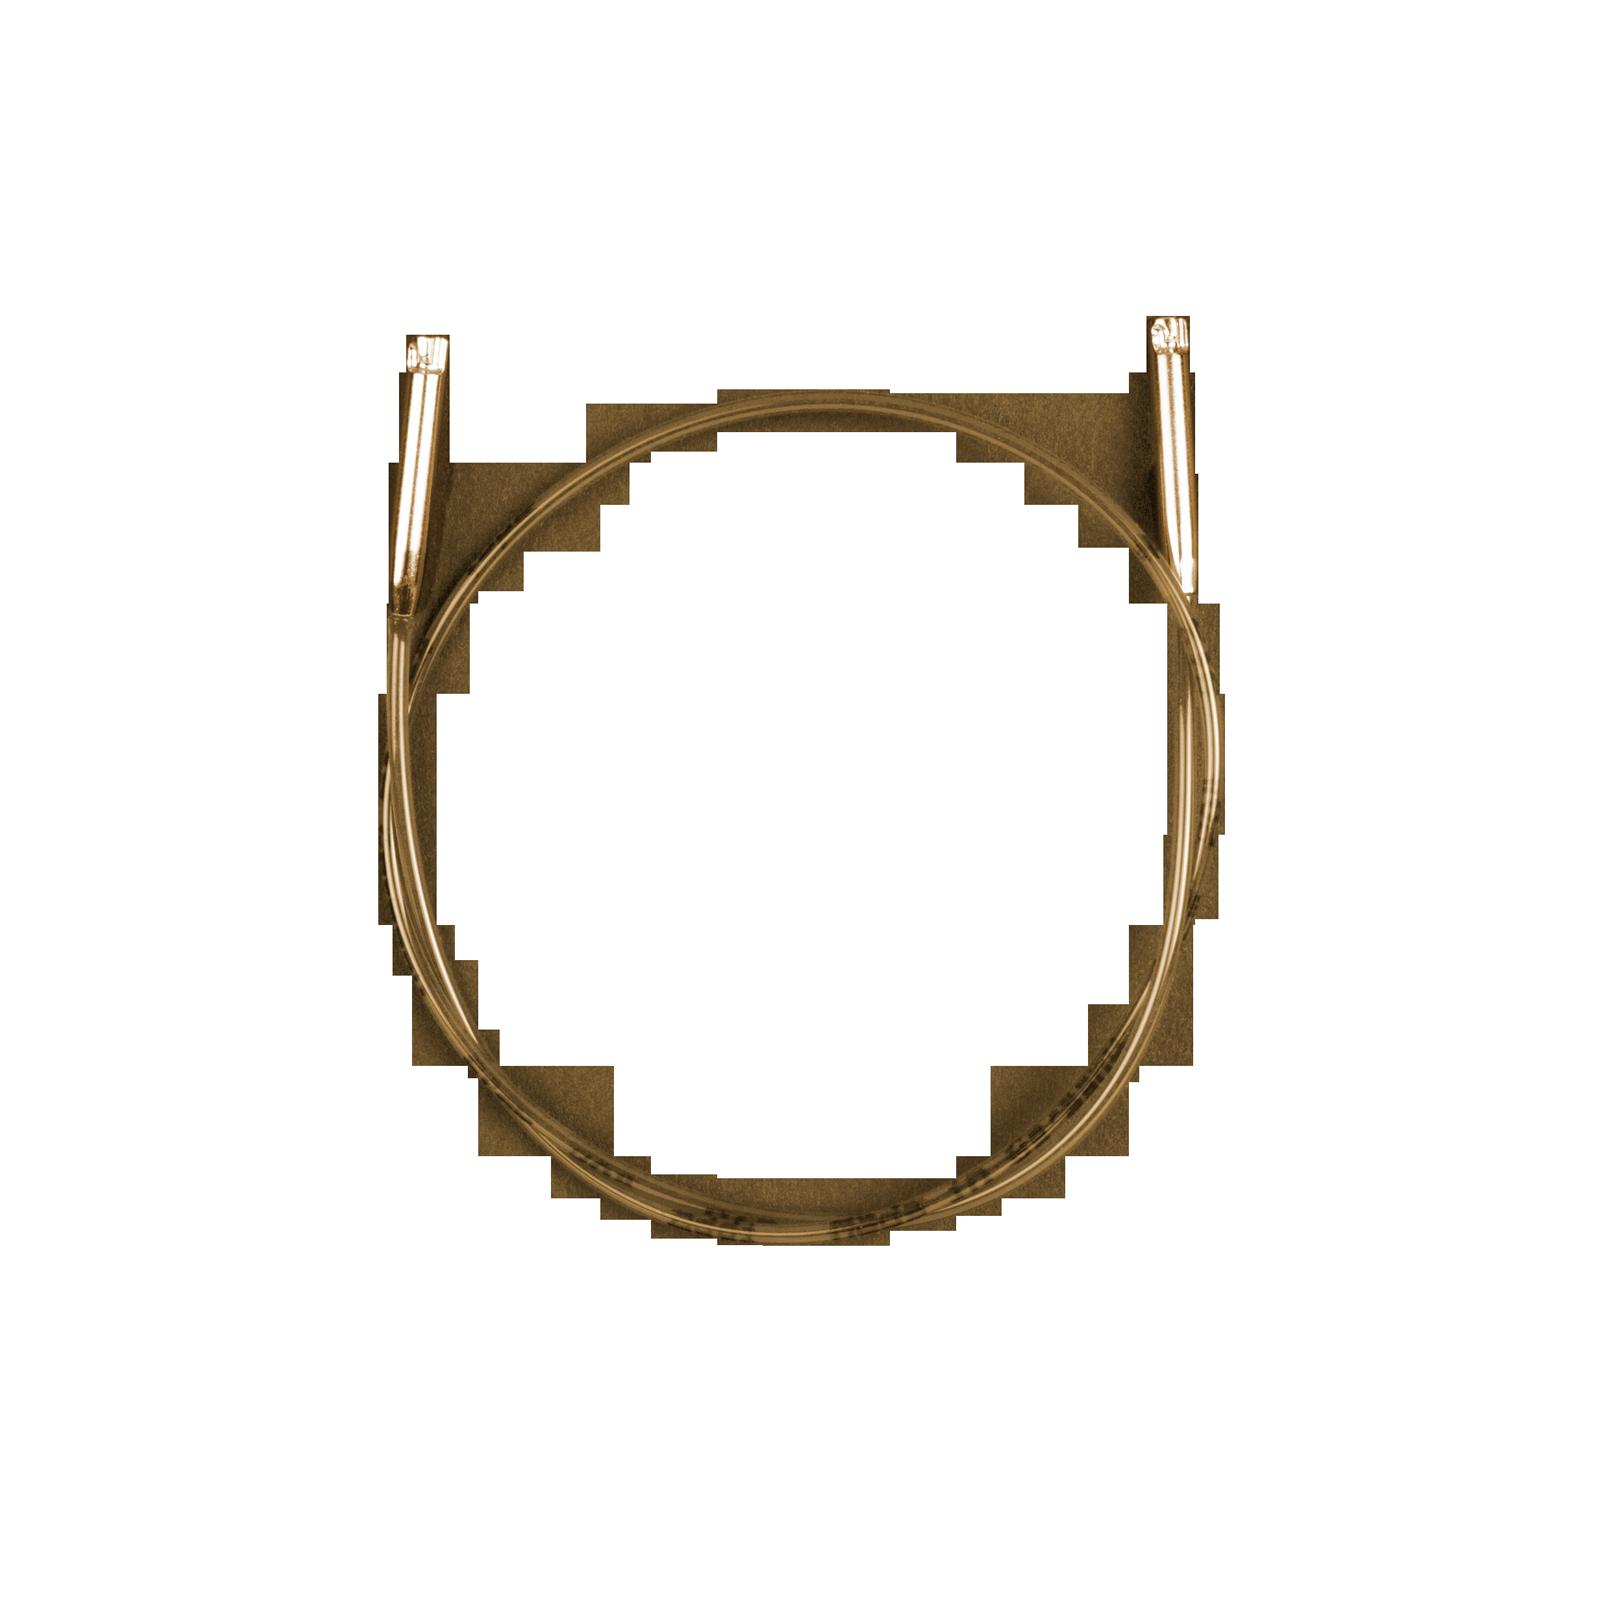 Addi 559-7 Click Bamboo Seil einzeln